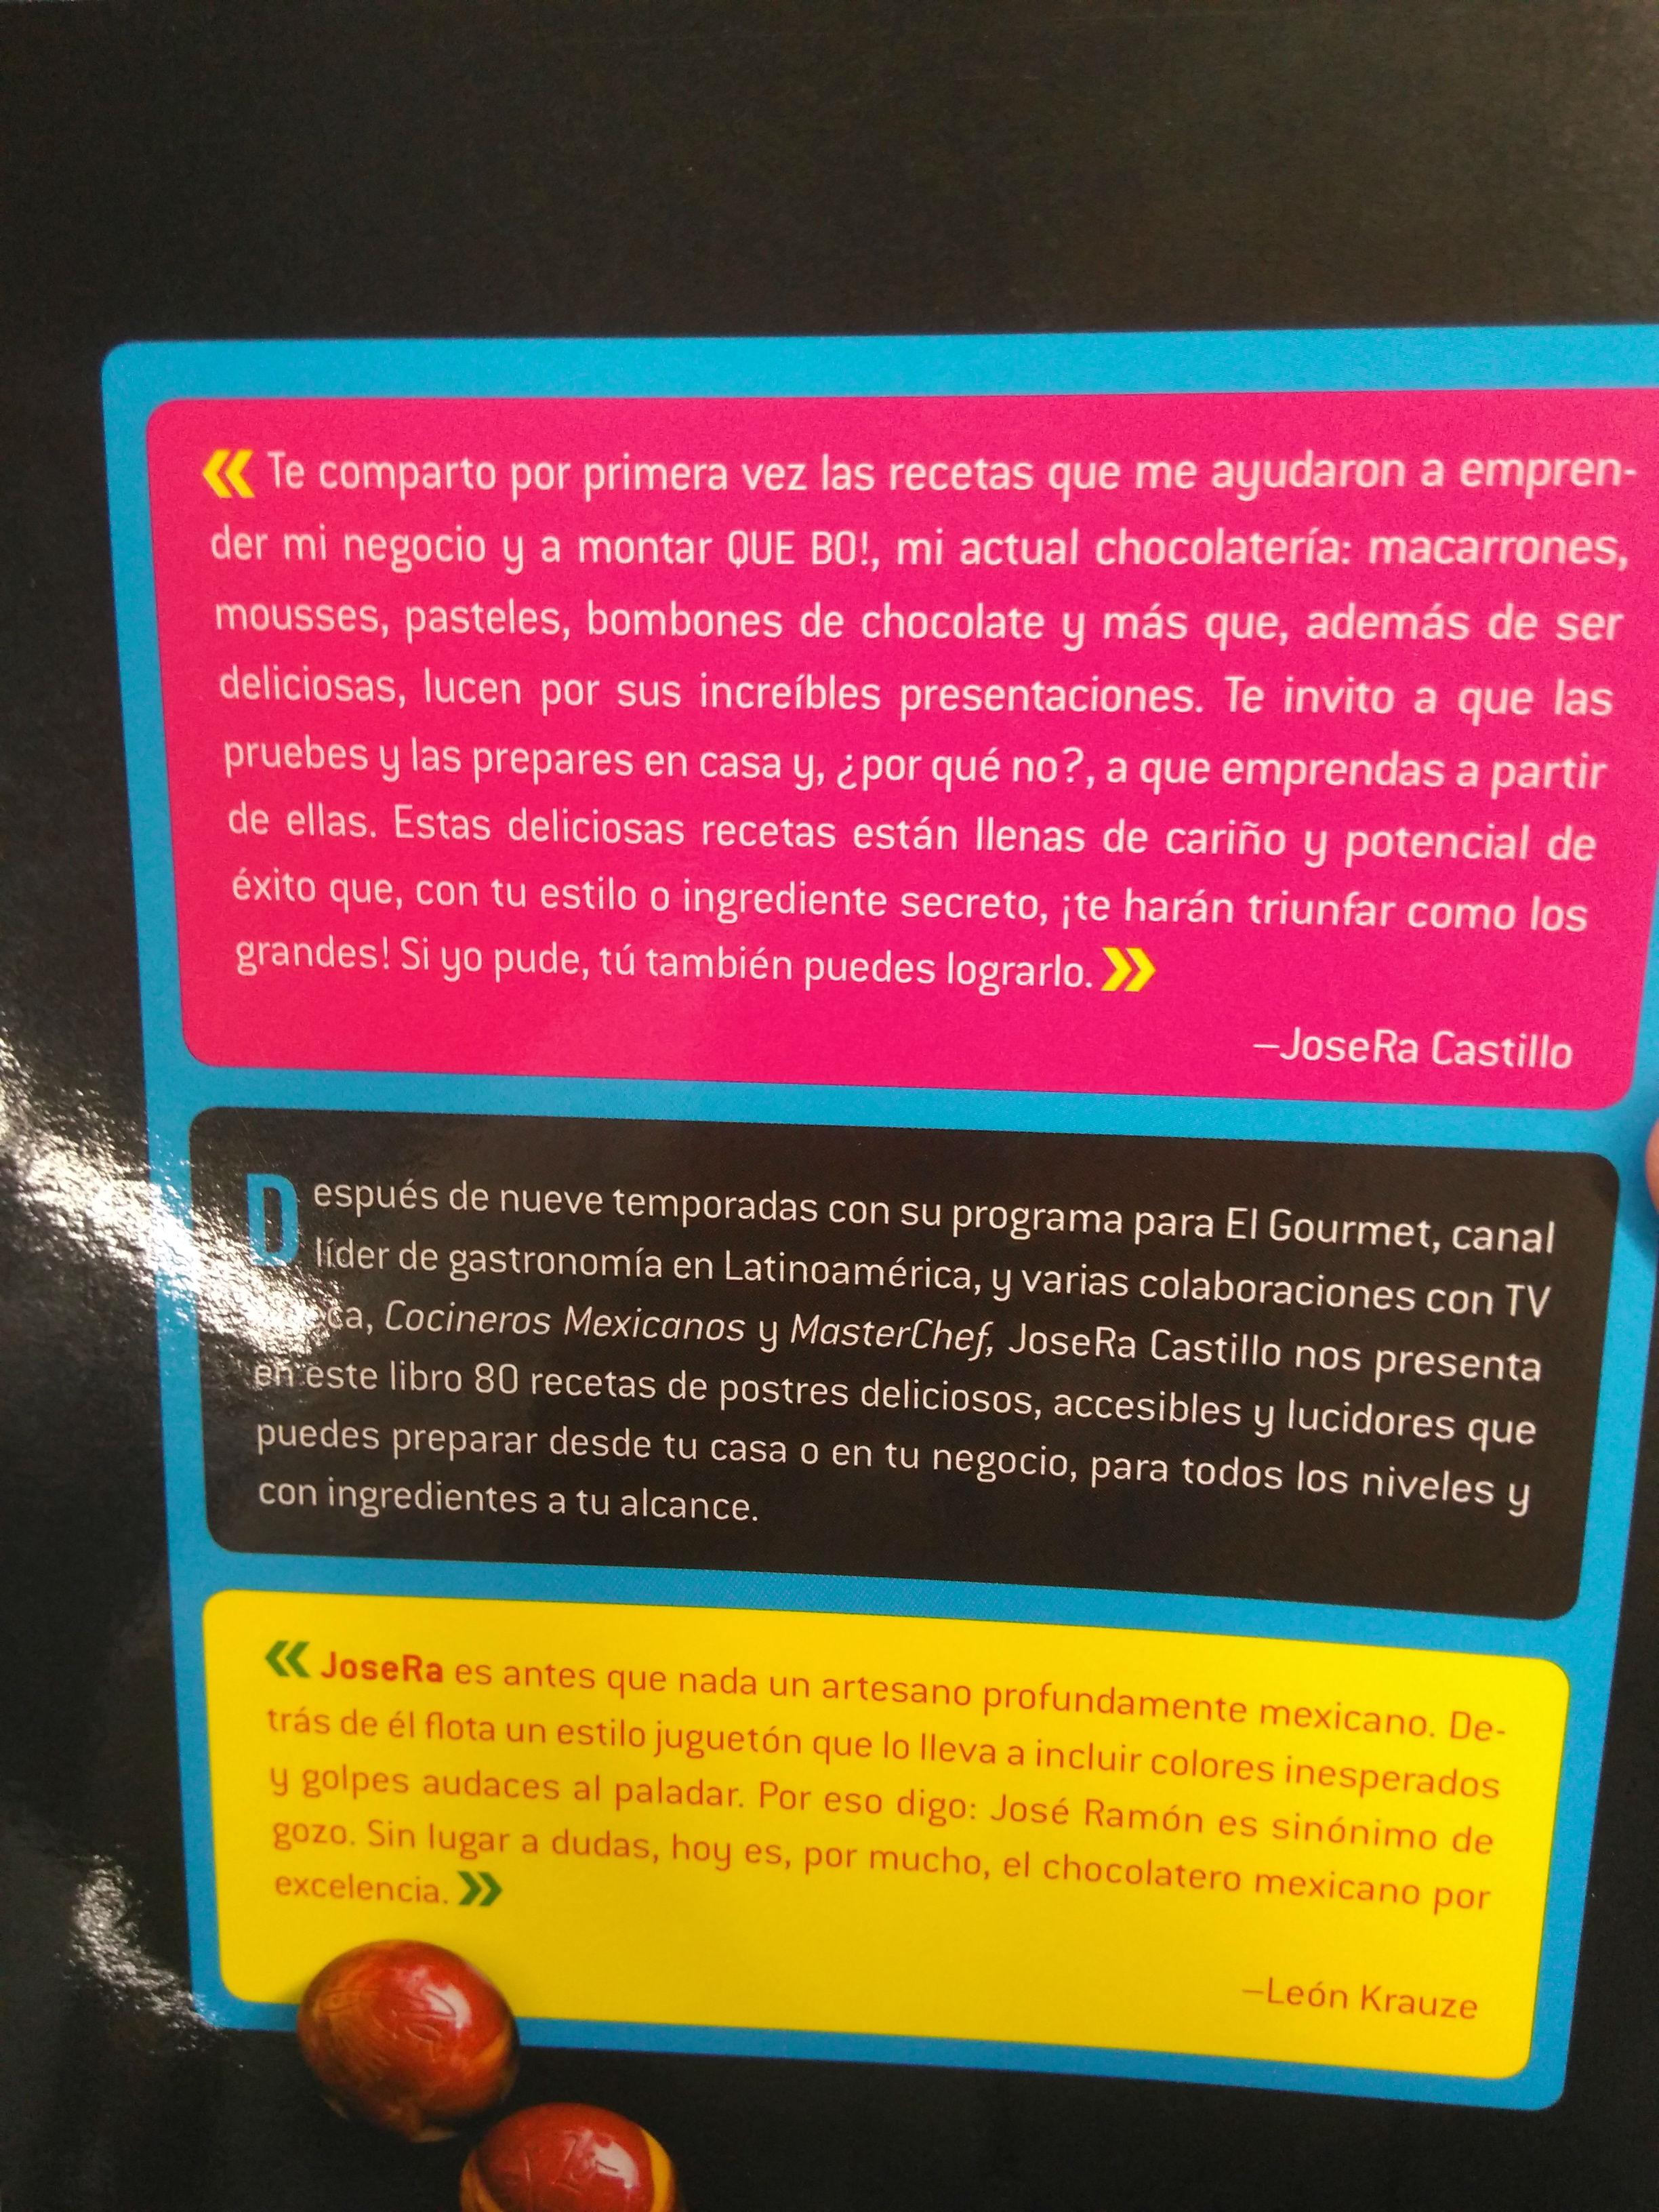 JoseRa Castillo Postres con cariño